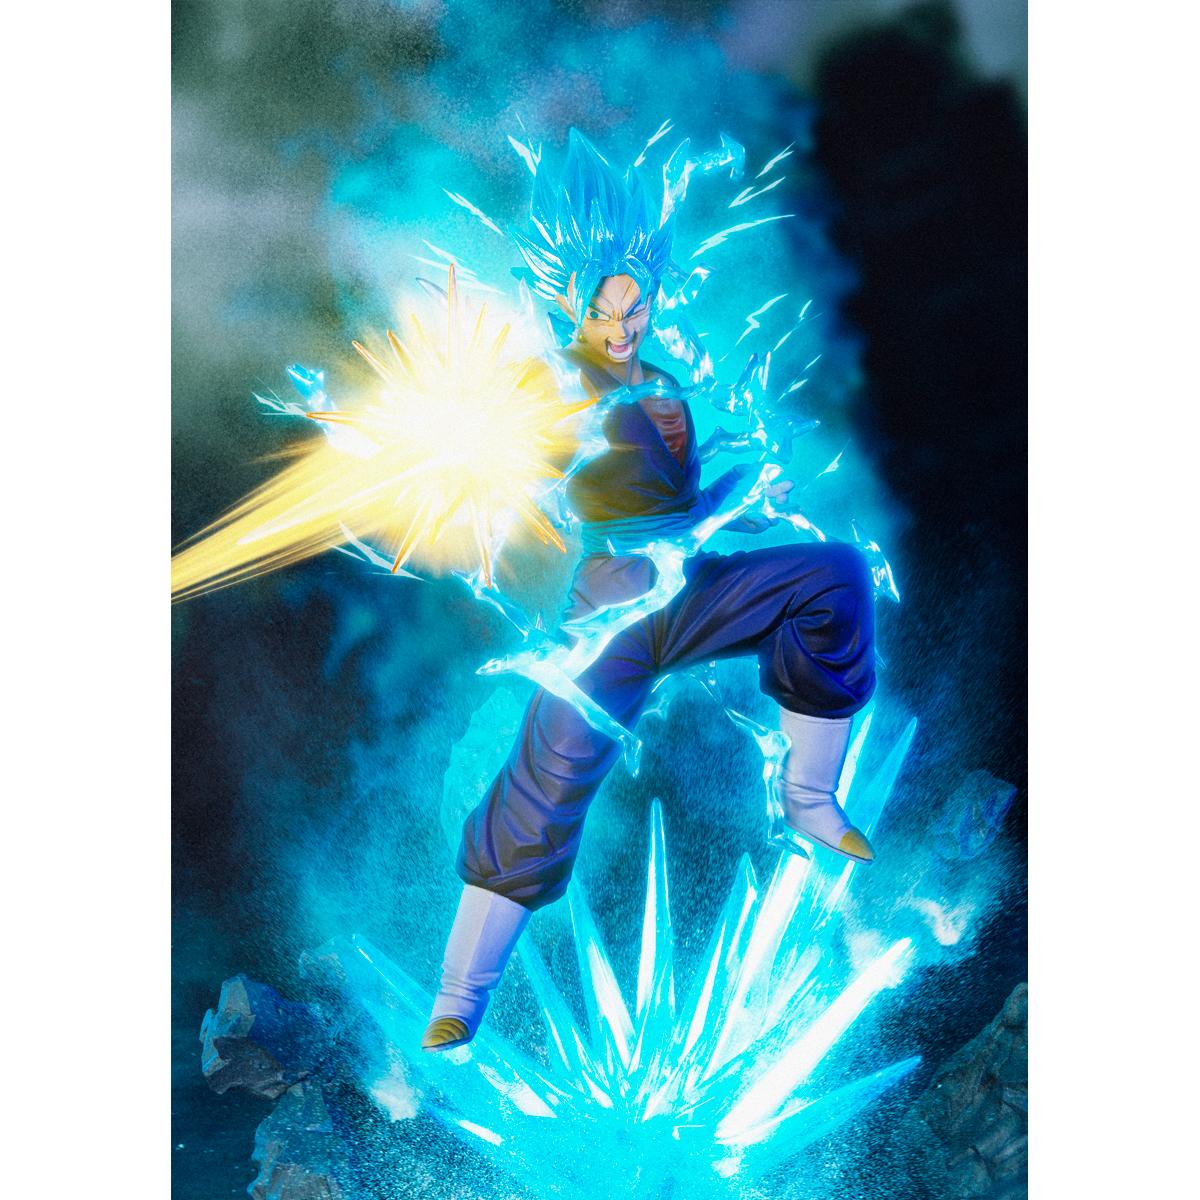 Figuarts ZERO SUPER SAIYAN GOD SUPER SAIYAN VEGITO-Event Exclusive Color Edition-[2020年9月發送]